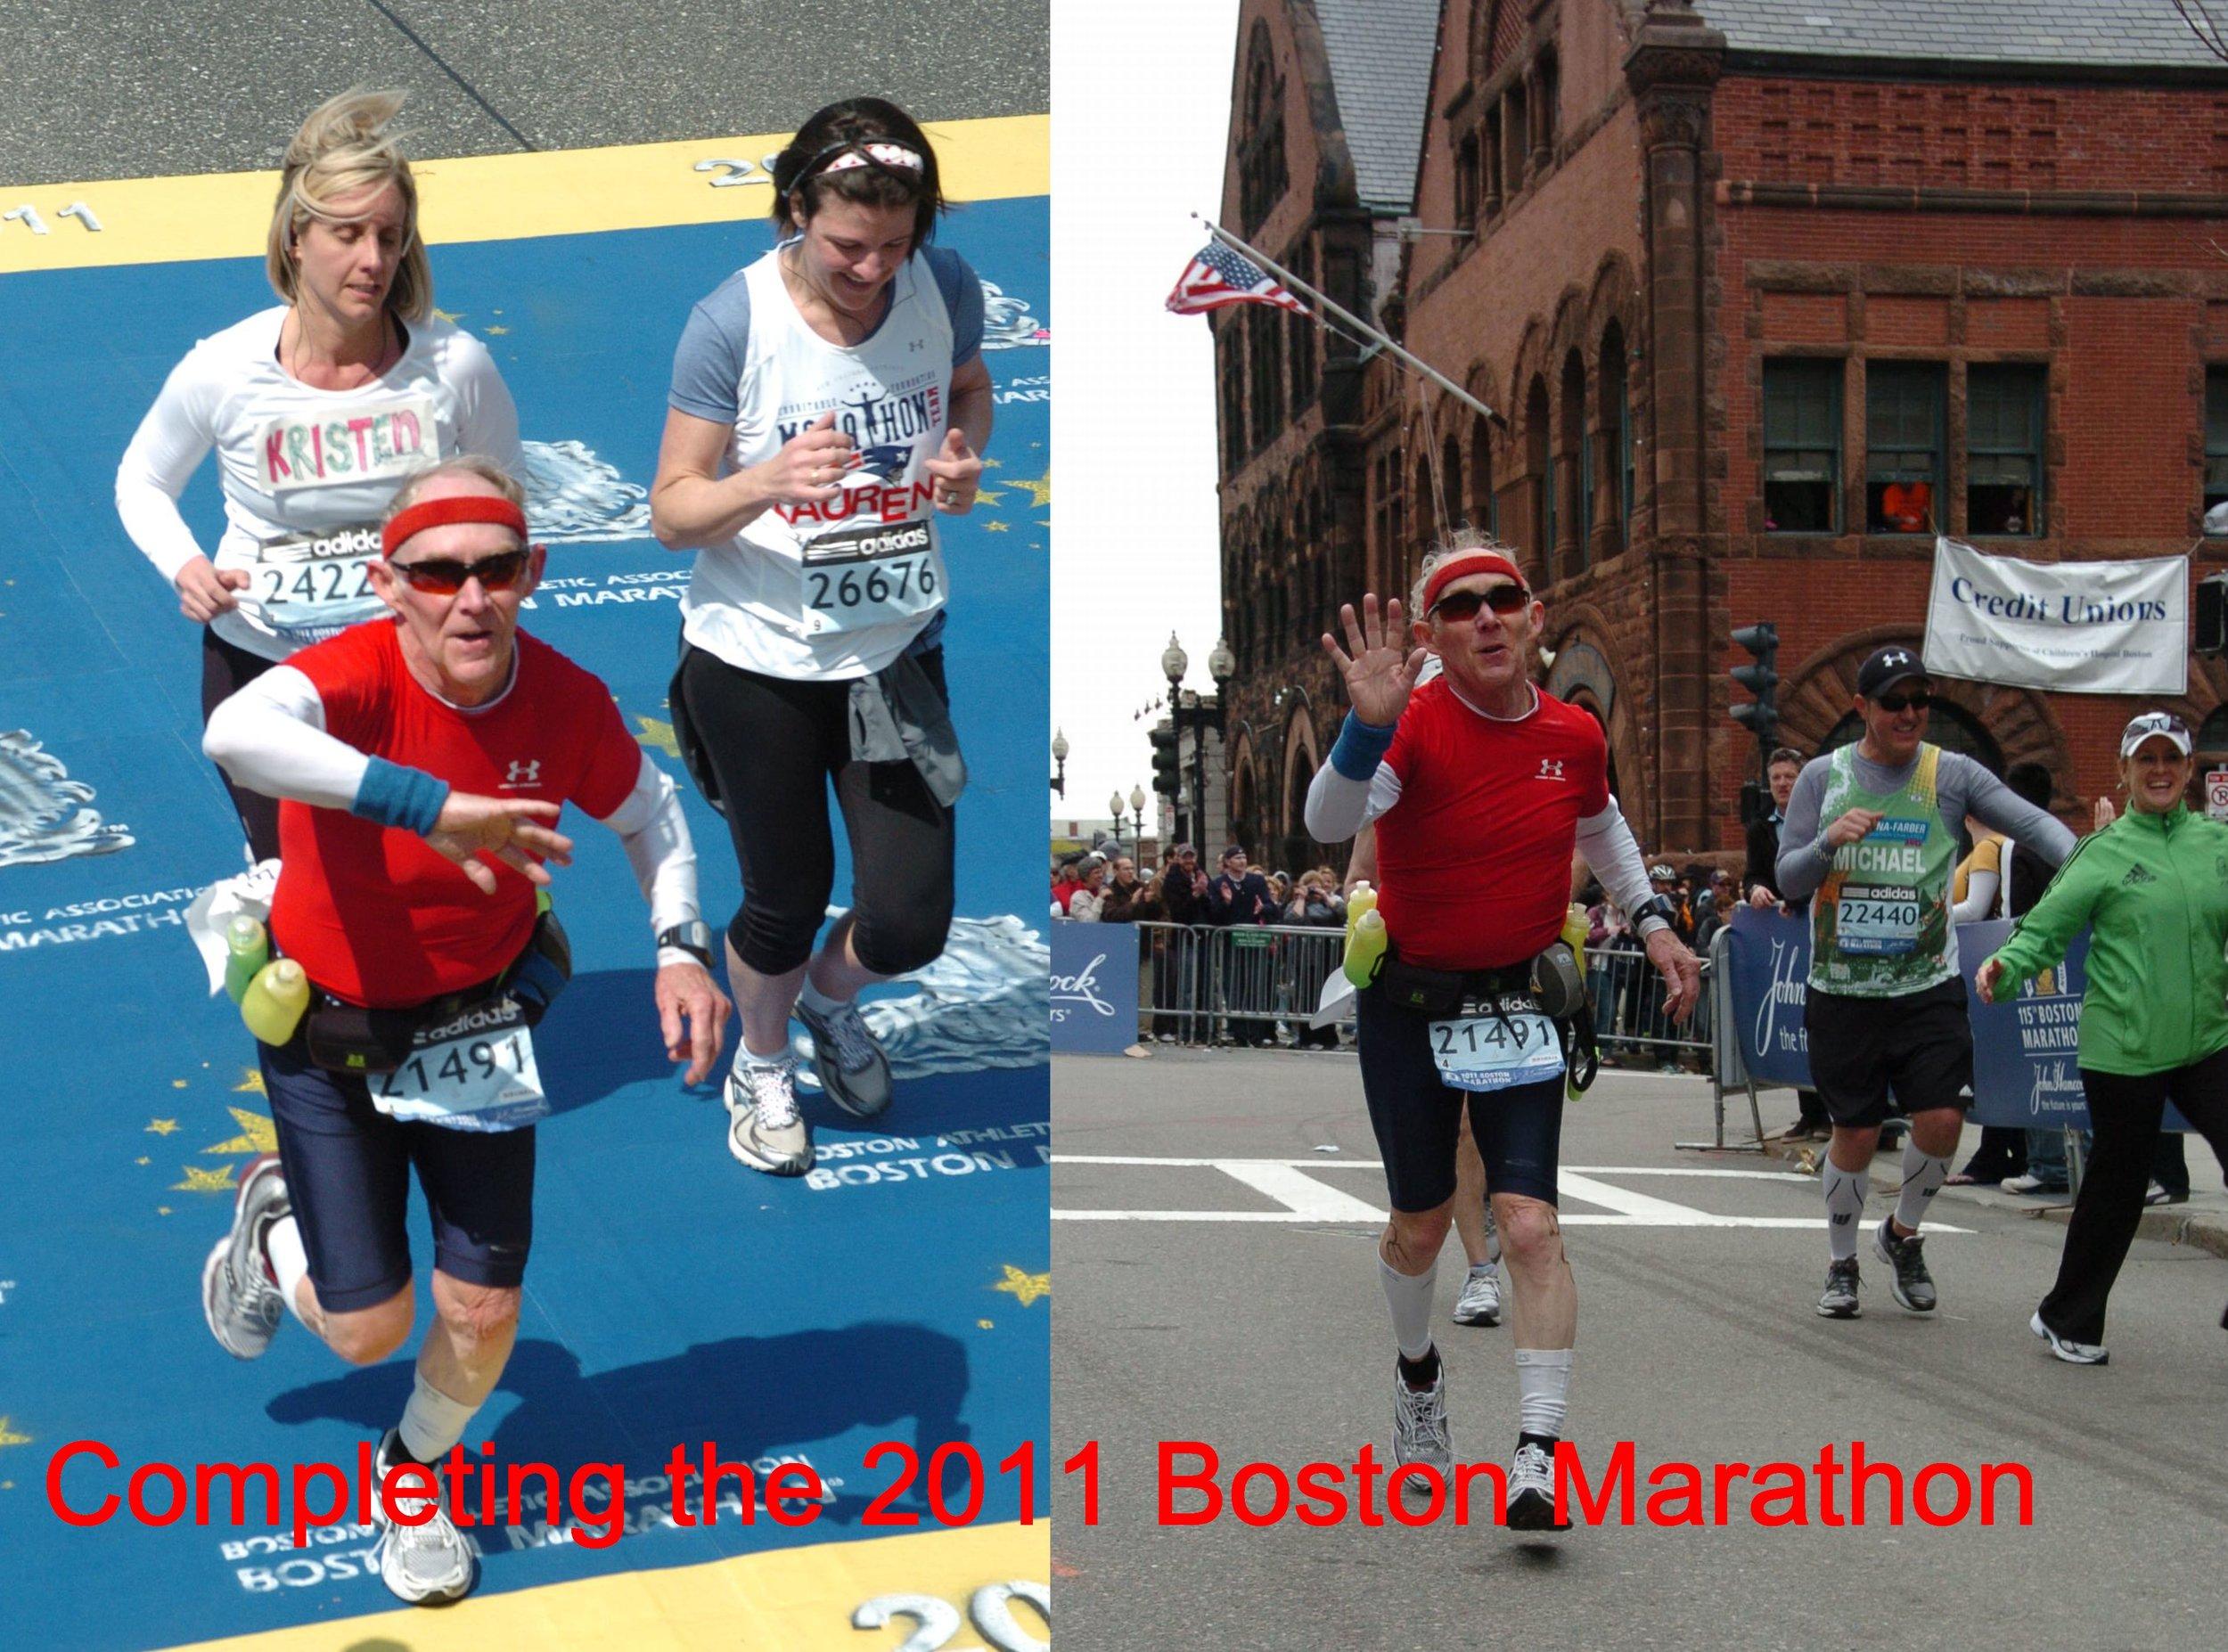 Joe Vicars, our guest on Episode 4, completes the Boston Marathon.